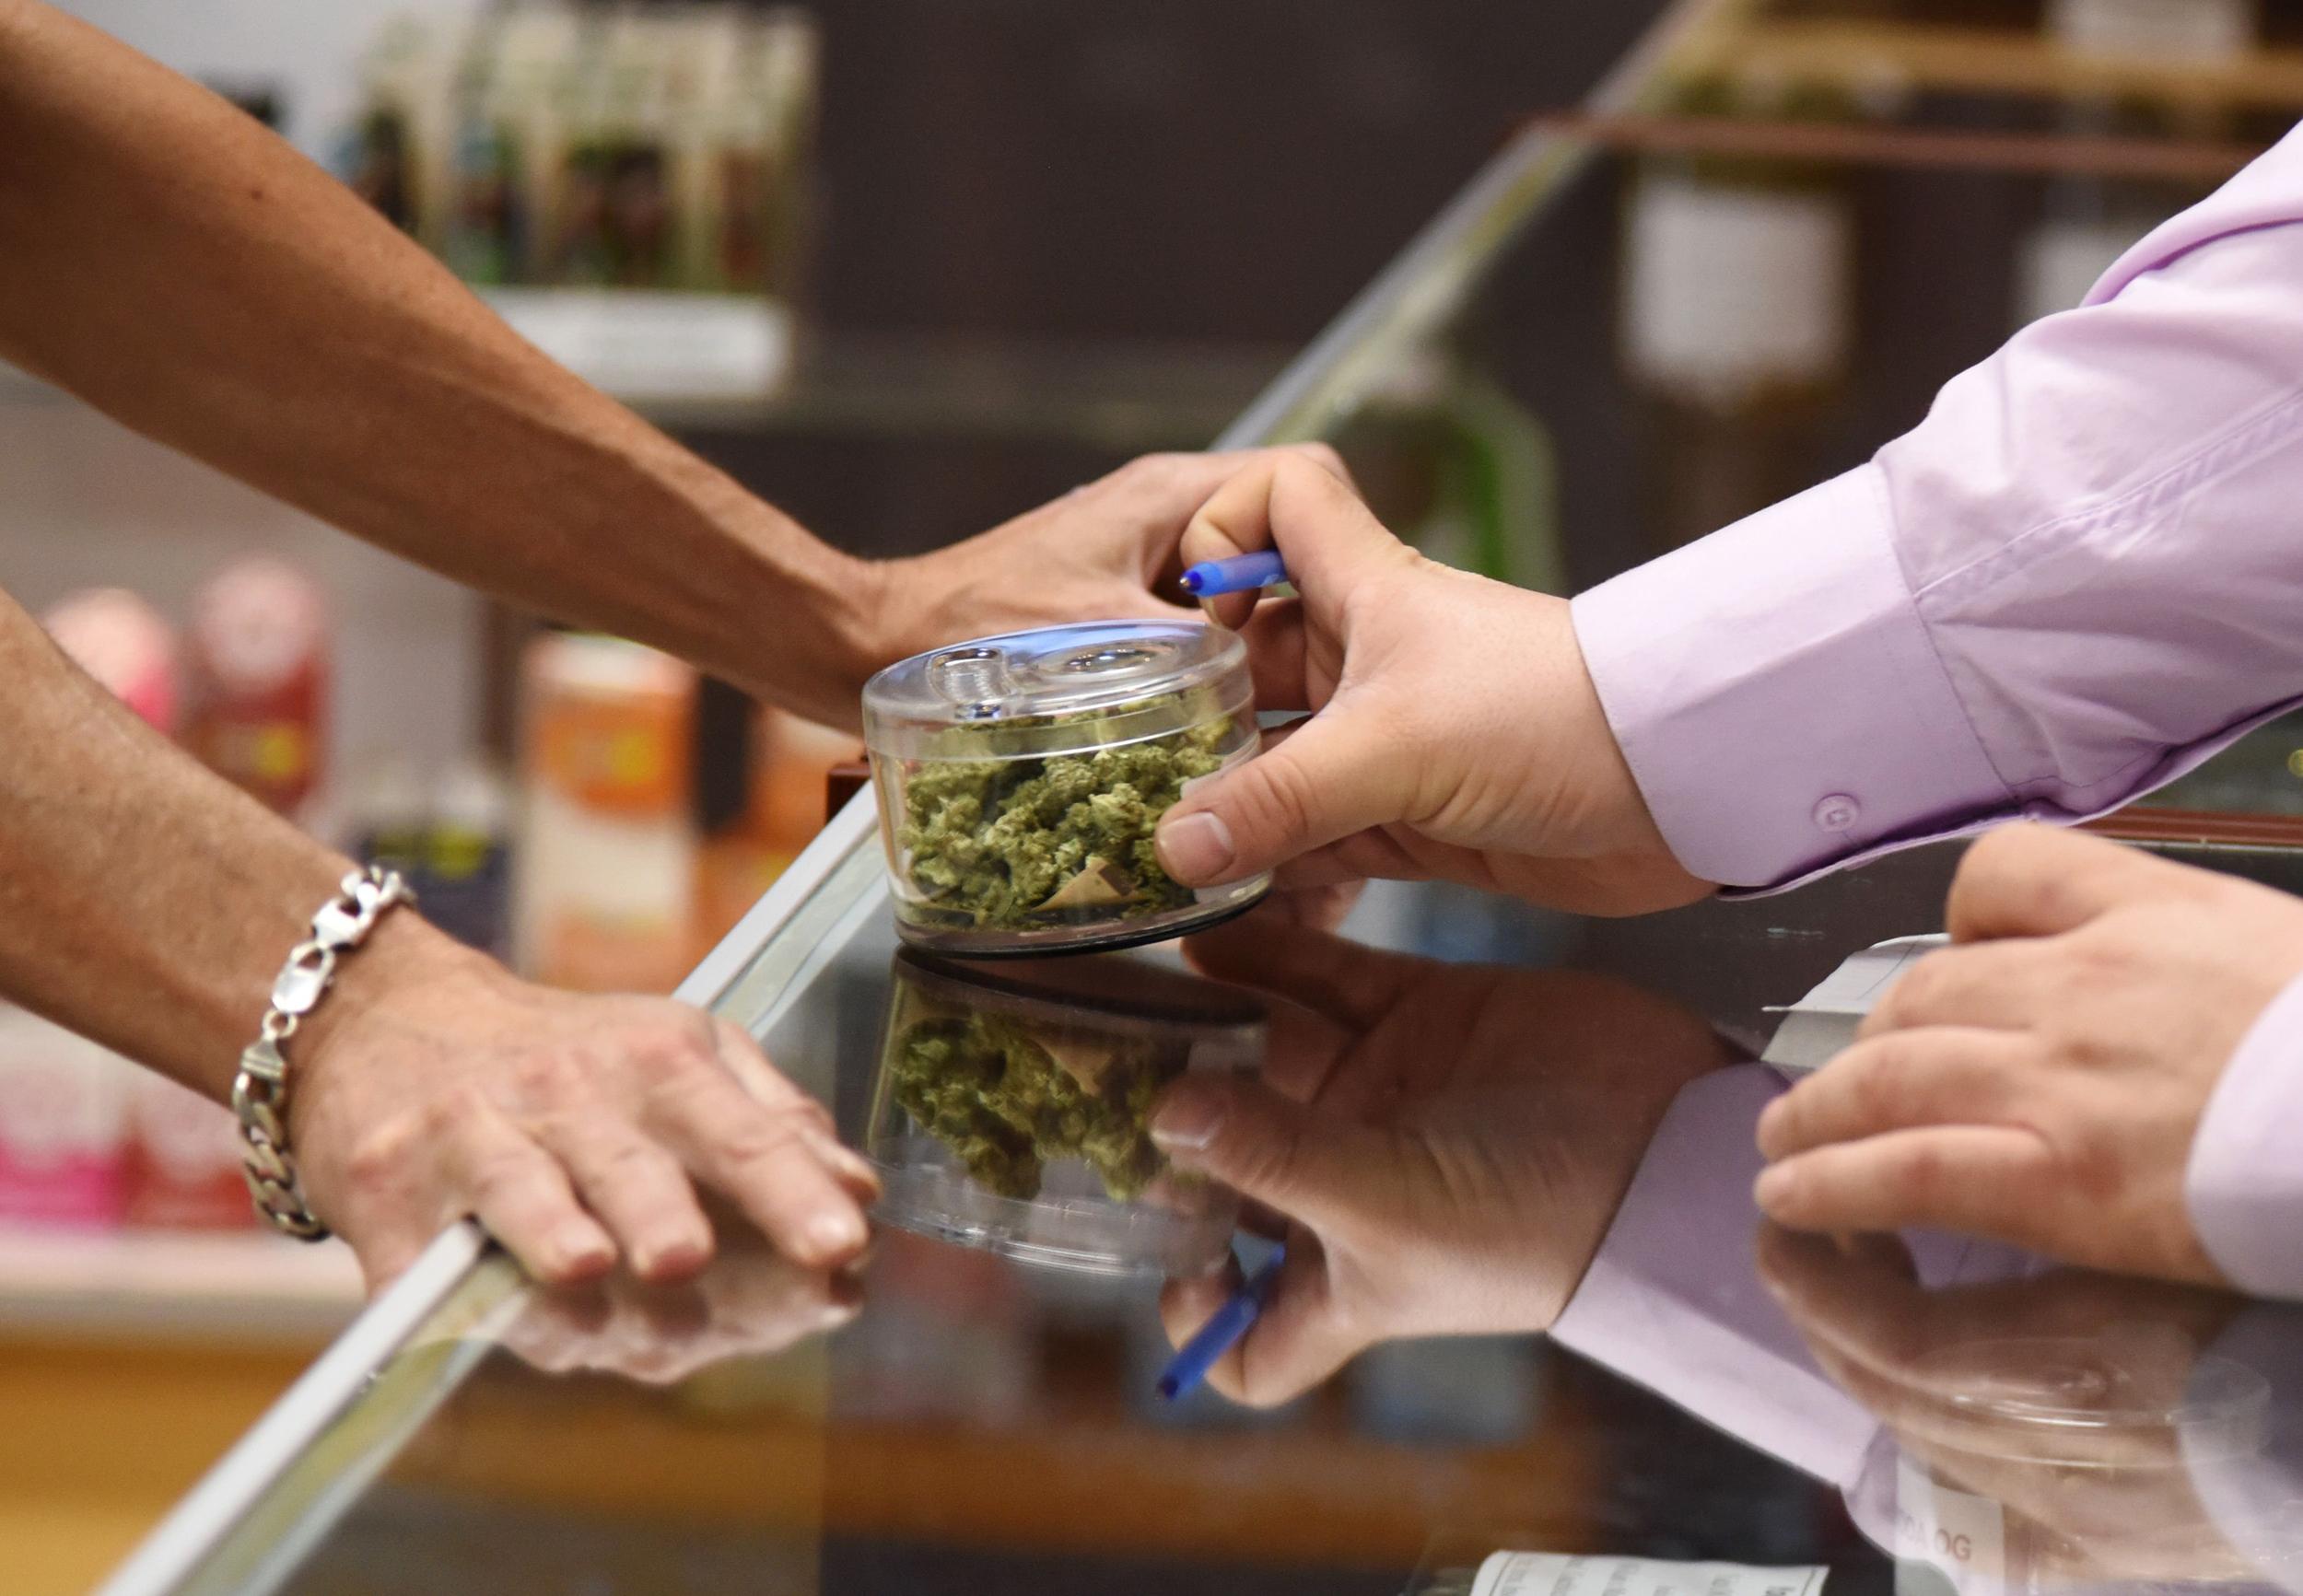 Vermont-senate-passes-bill-to-legalize-recreational-marijuana-use